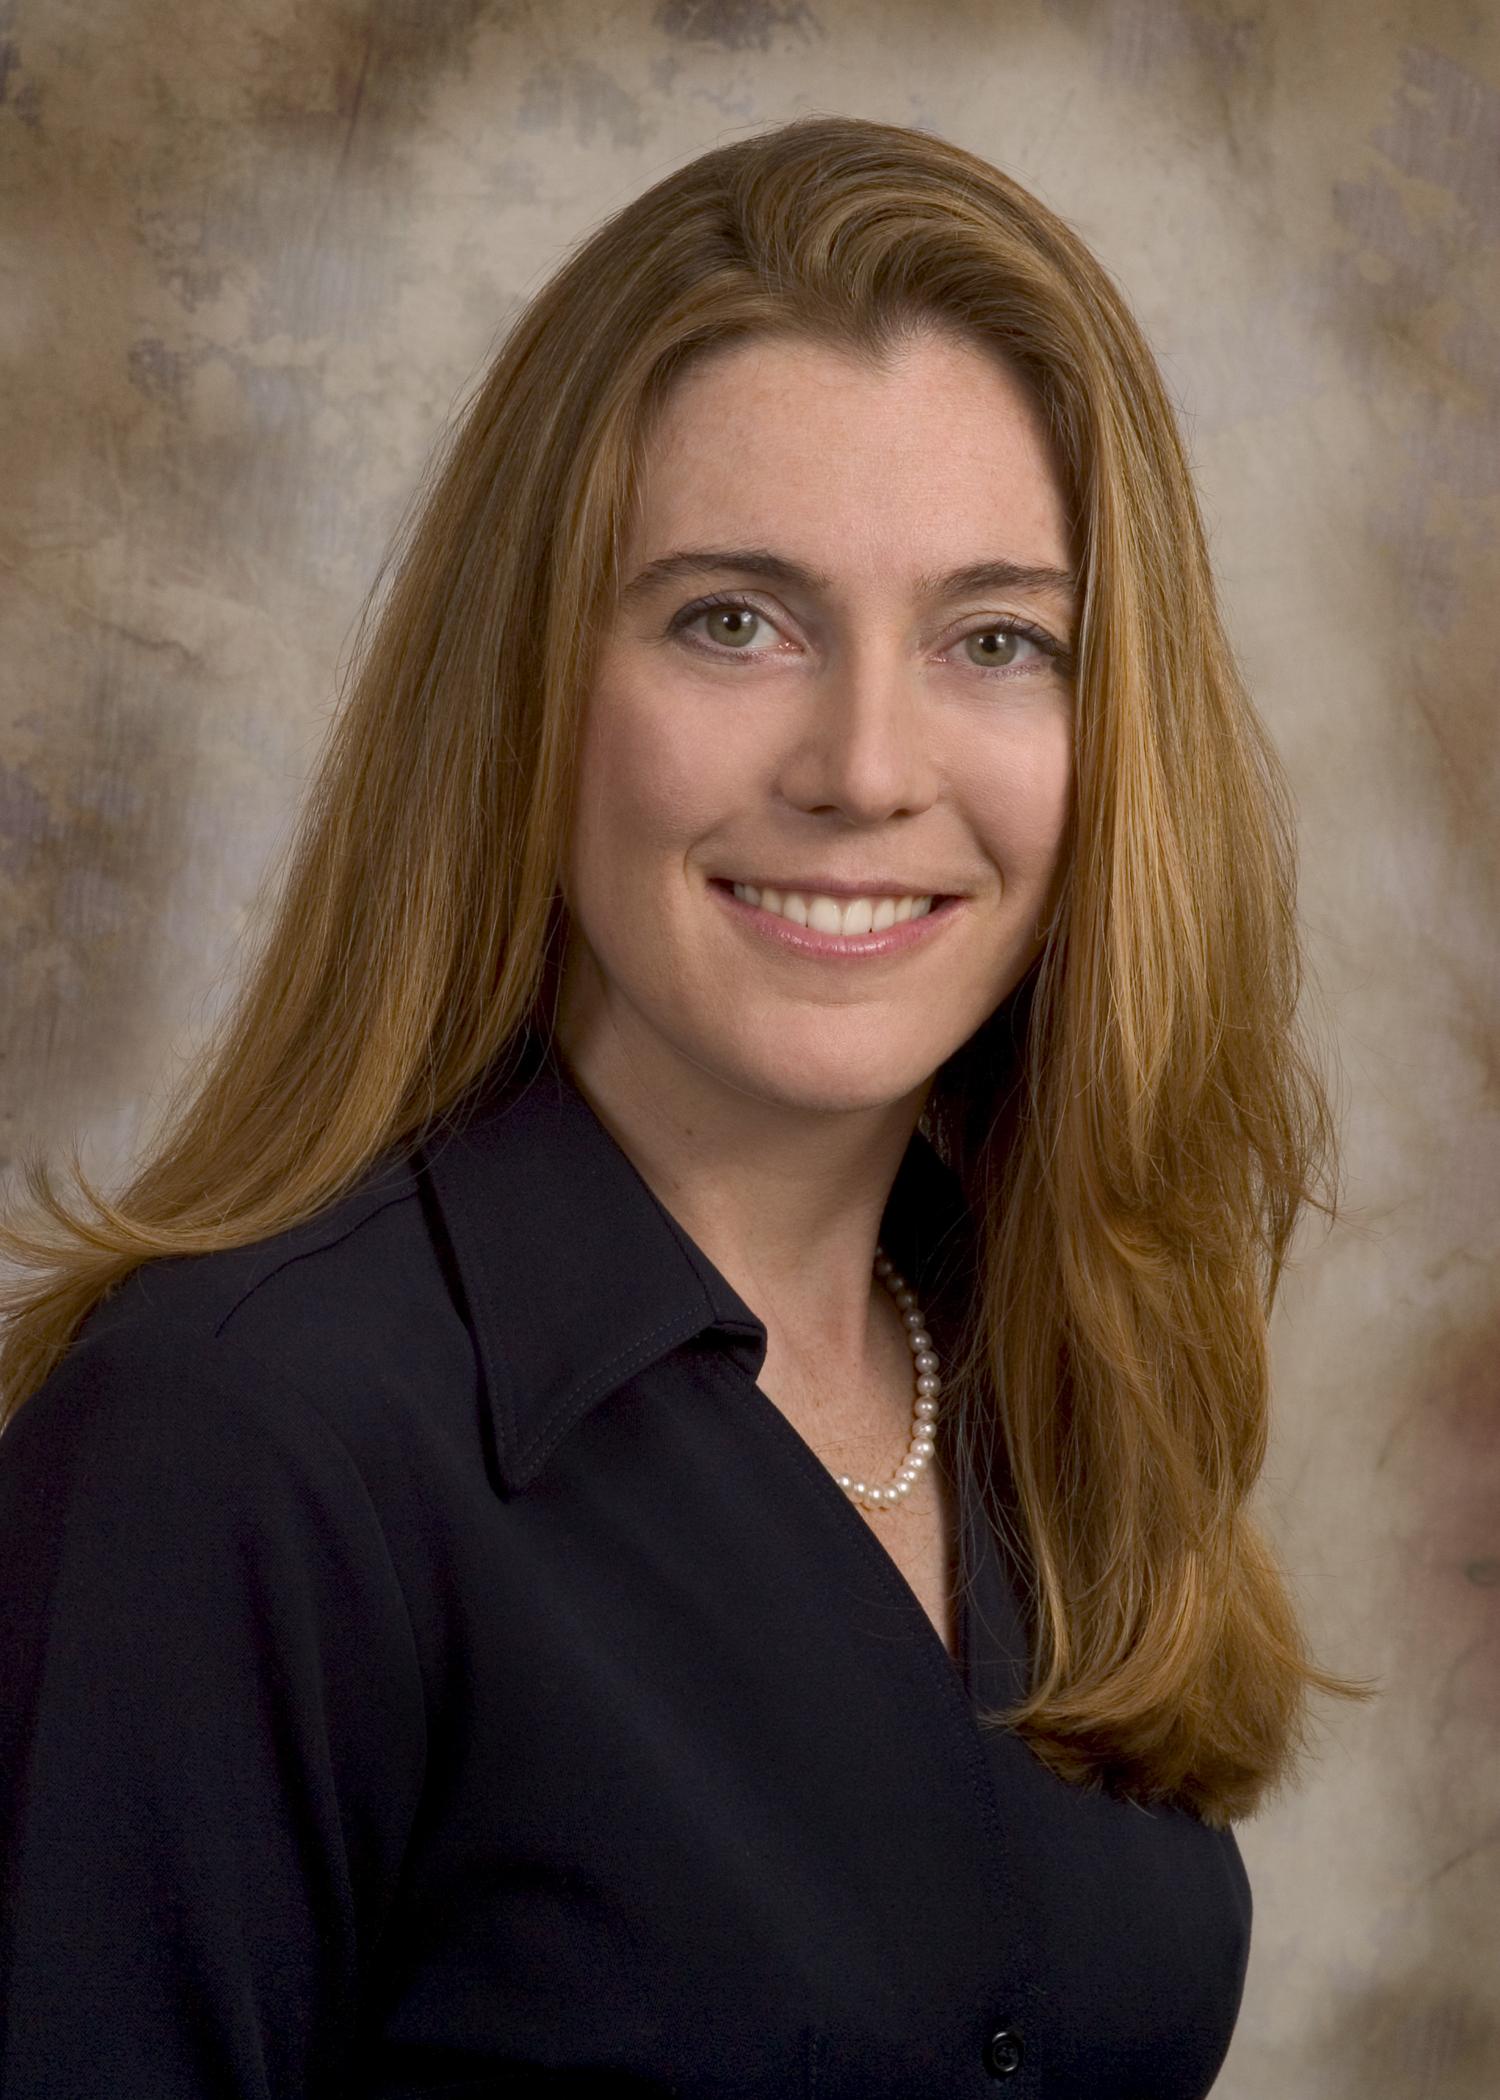 Sharon Jacob, M.D. Dermatology